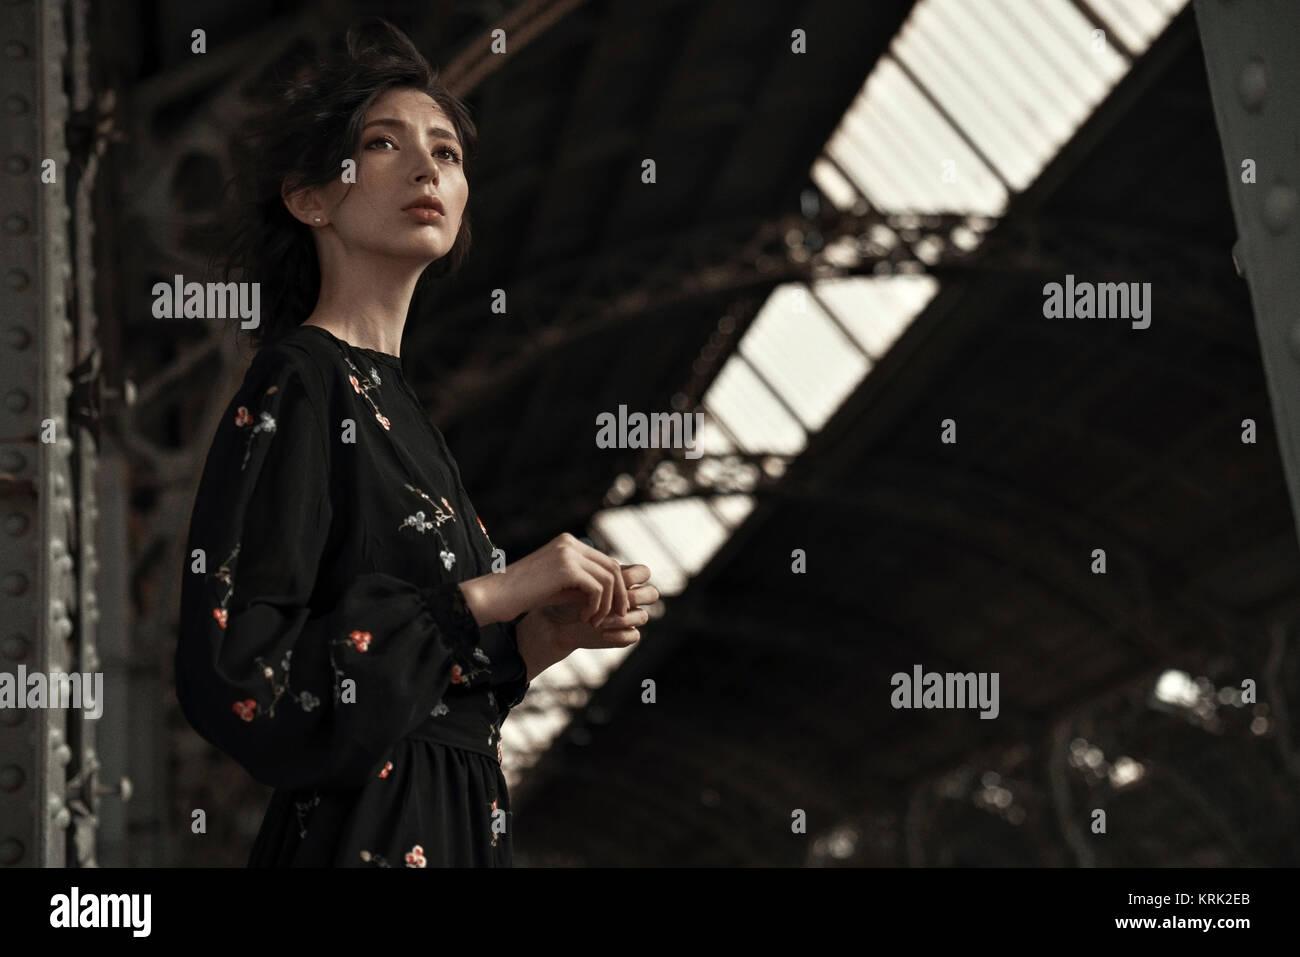 Caucasian woman waiting at train station - Stock Image